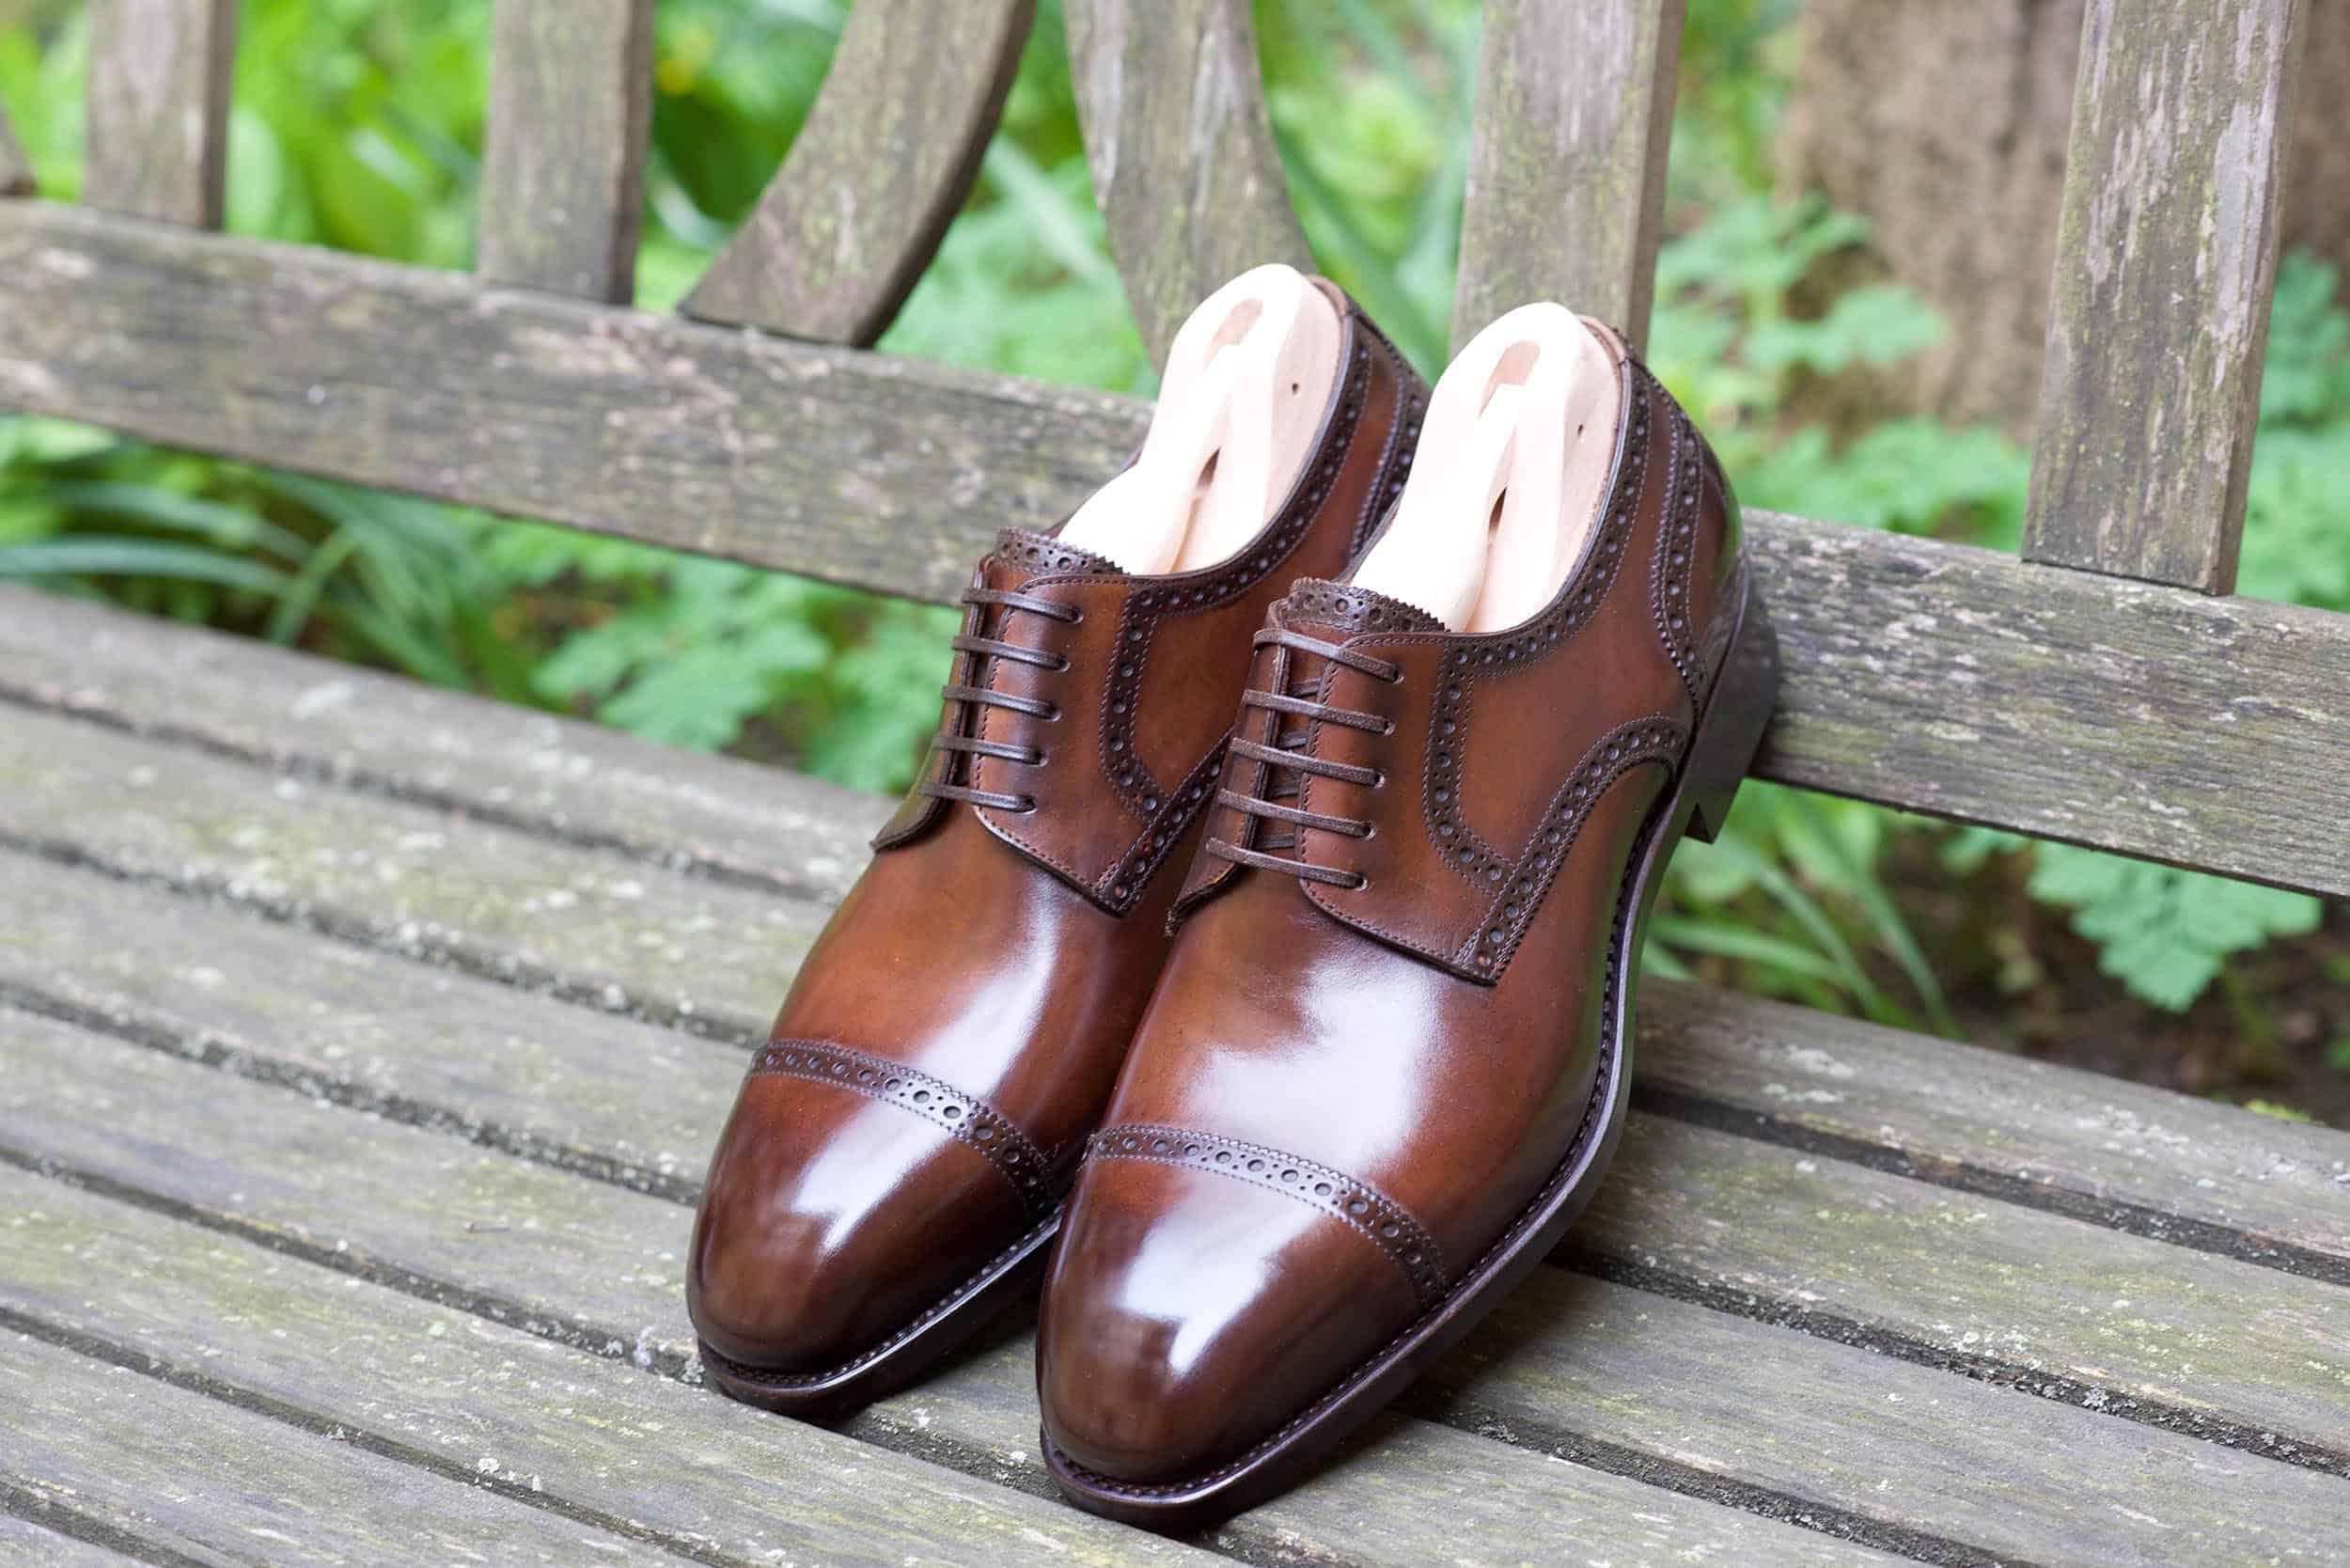 69df0de69a3 Nyhet – Paolo Scafora Skoaktiebolagets nya märke – Shoegazing